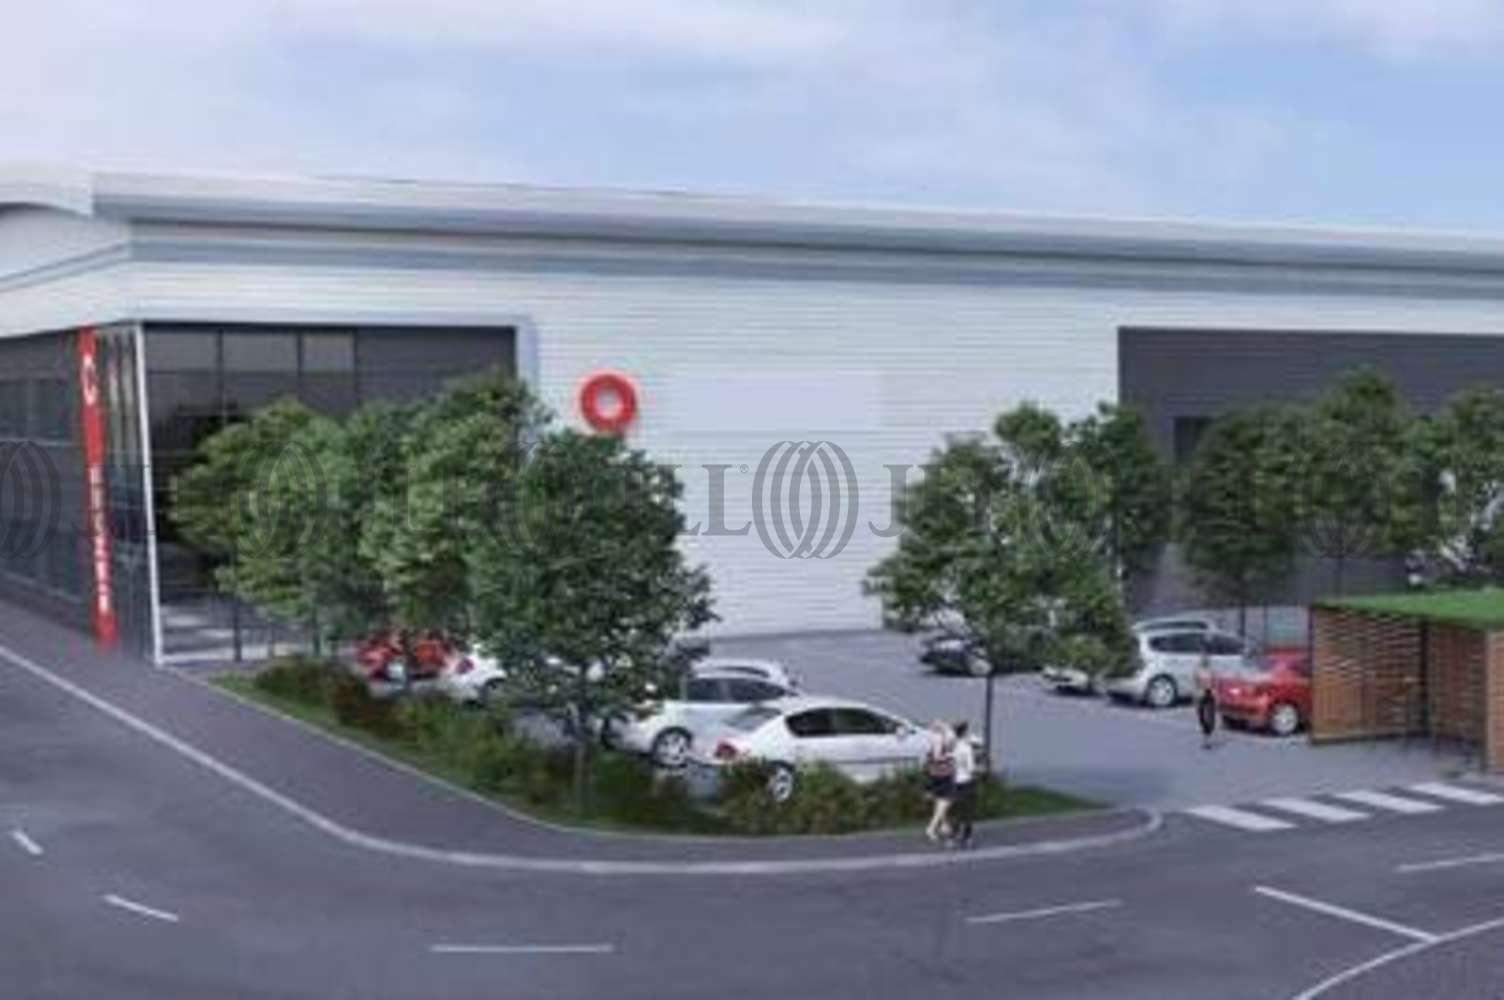 Industrial Greenford, UB6 8PW - Unit C, Fairway Drive